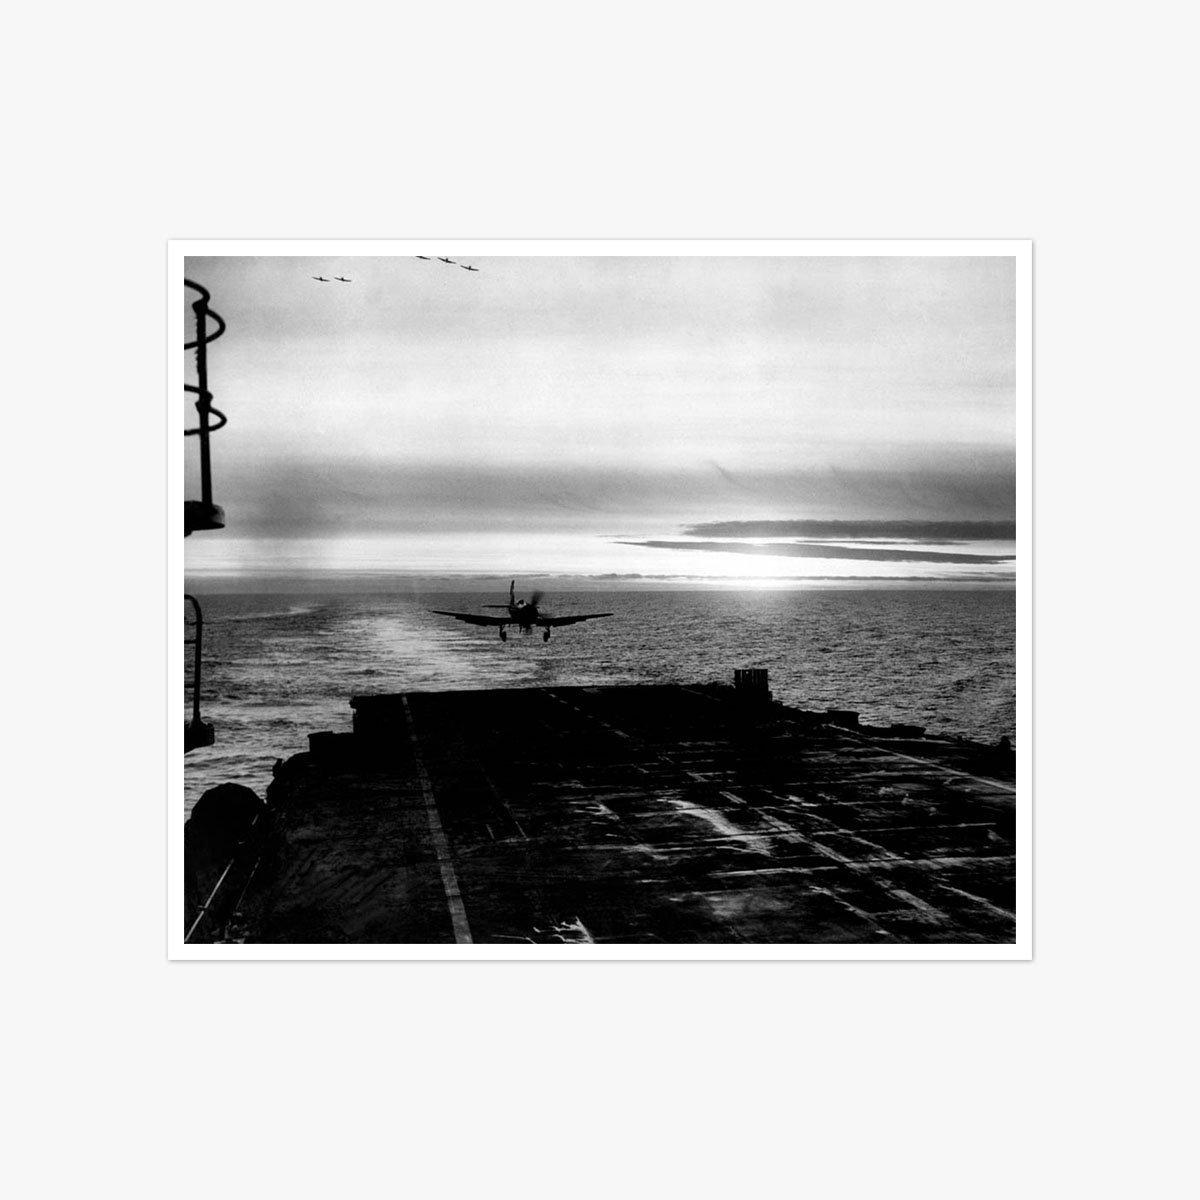 Plane Landing On Aircraft Carrier Eagle by Herbert Mason